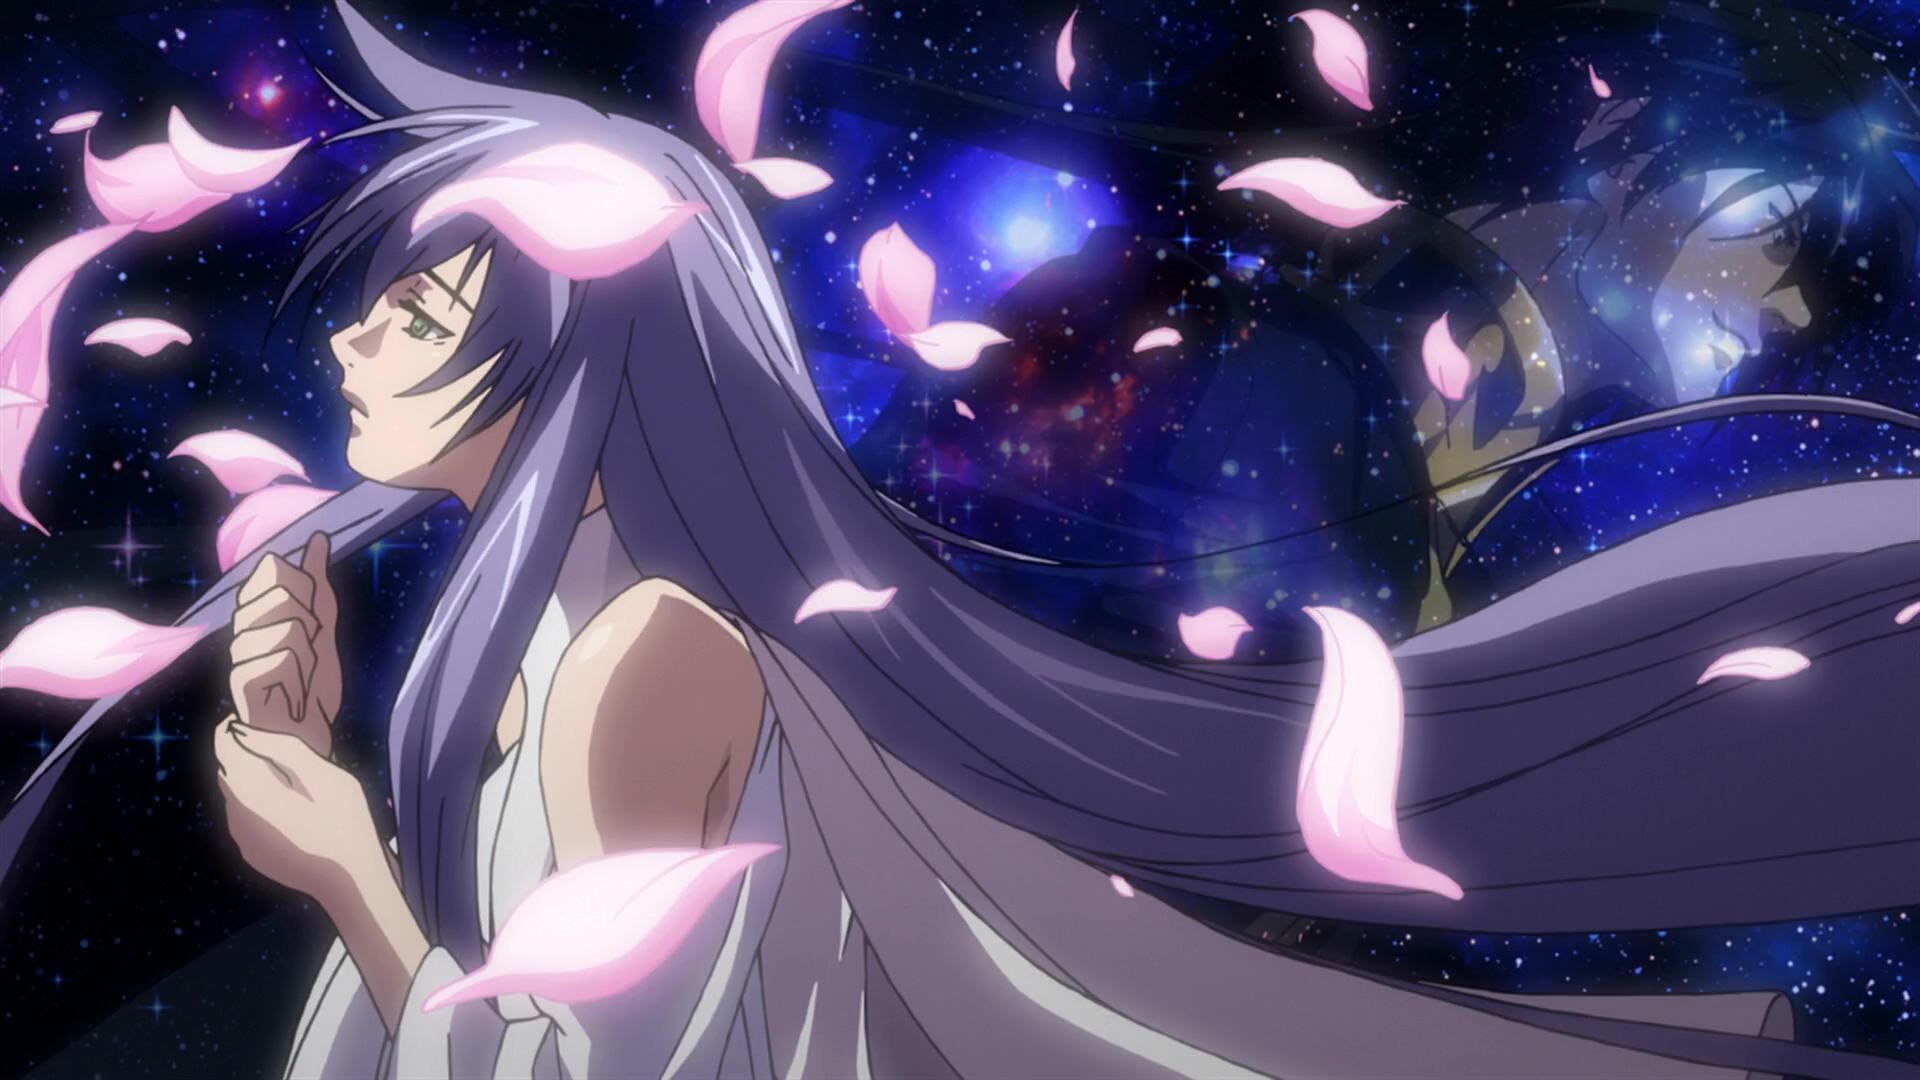 1080p冥王神话萨莎女神高清精选美图